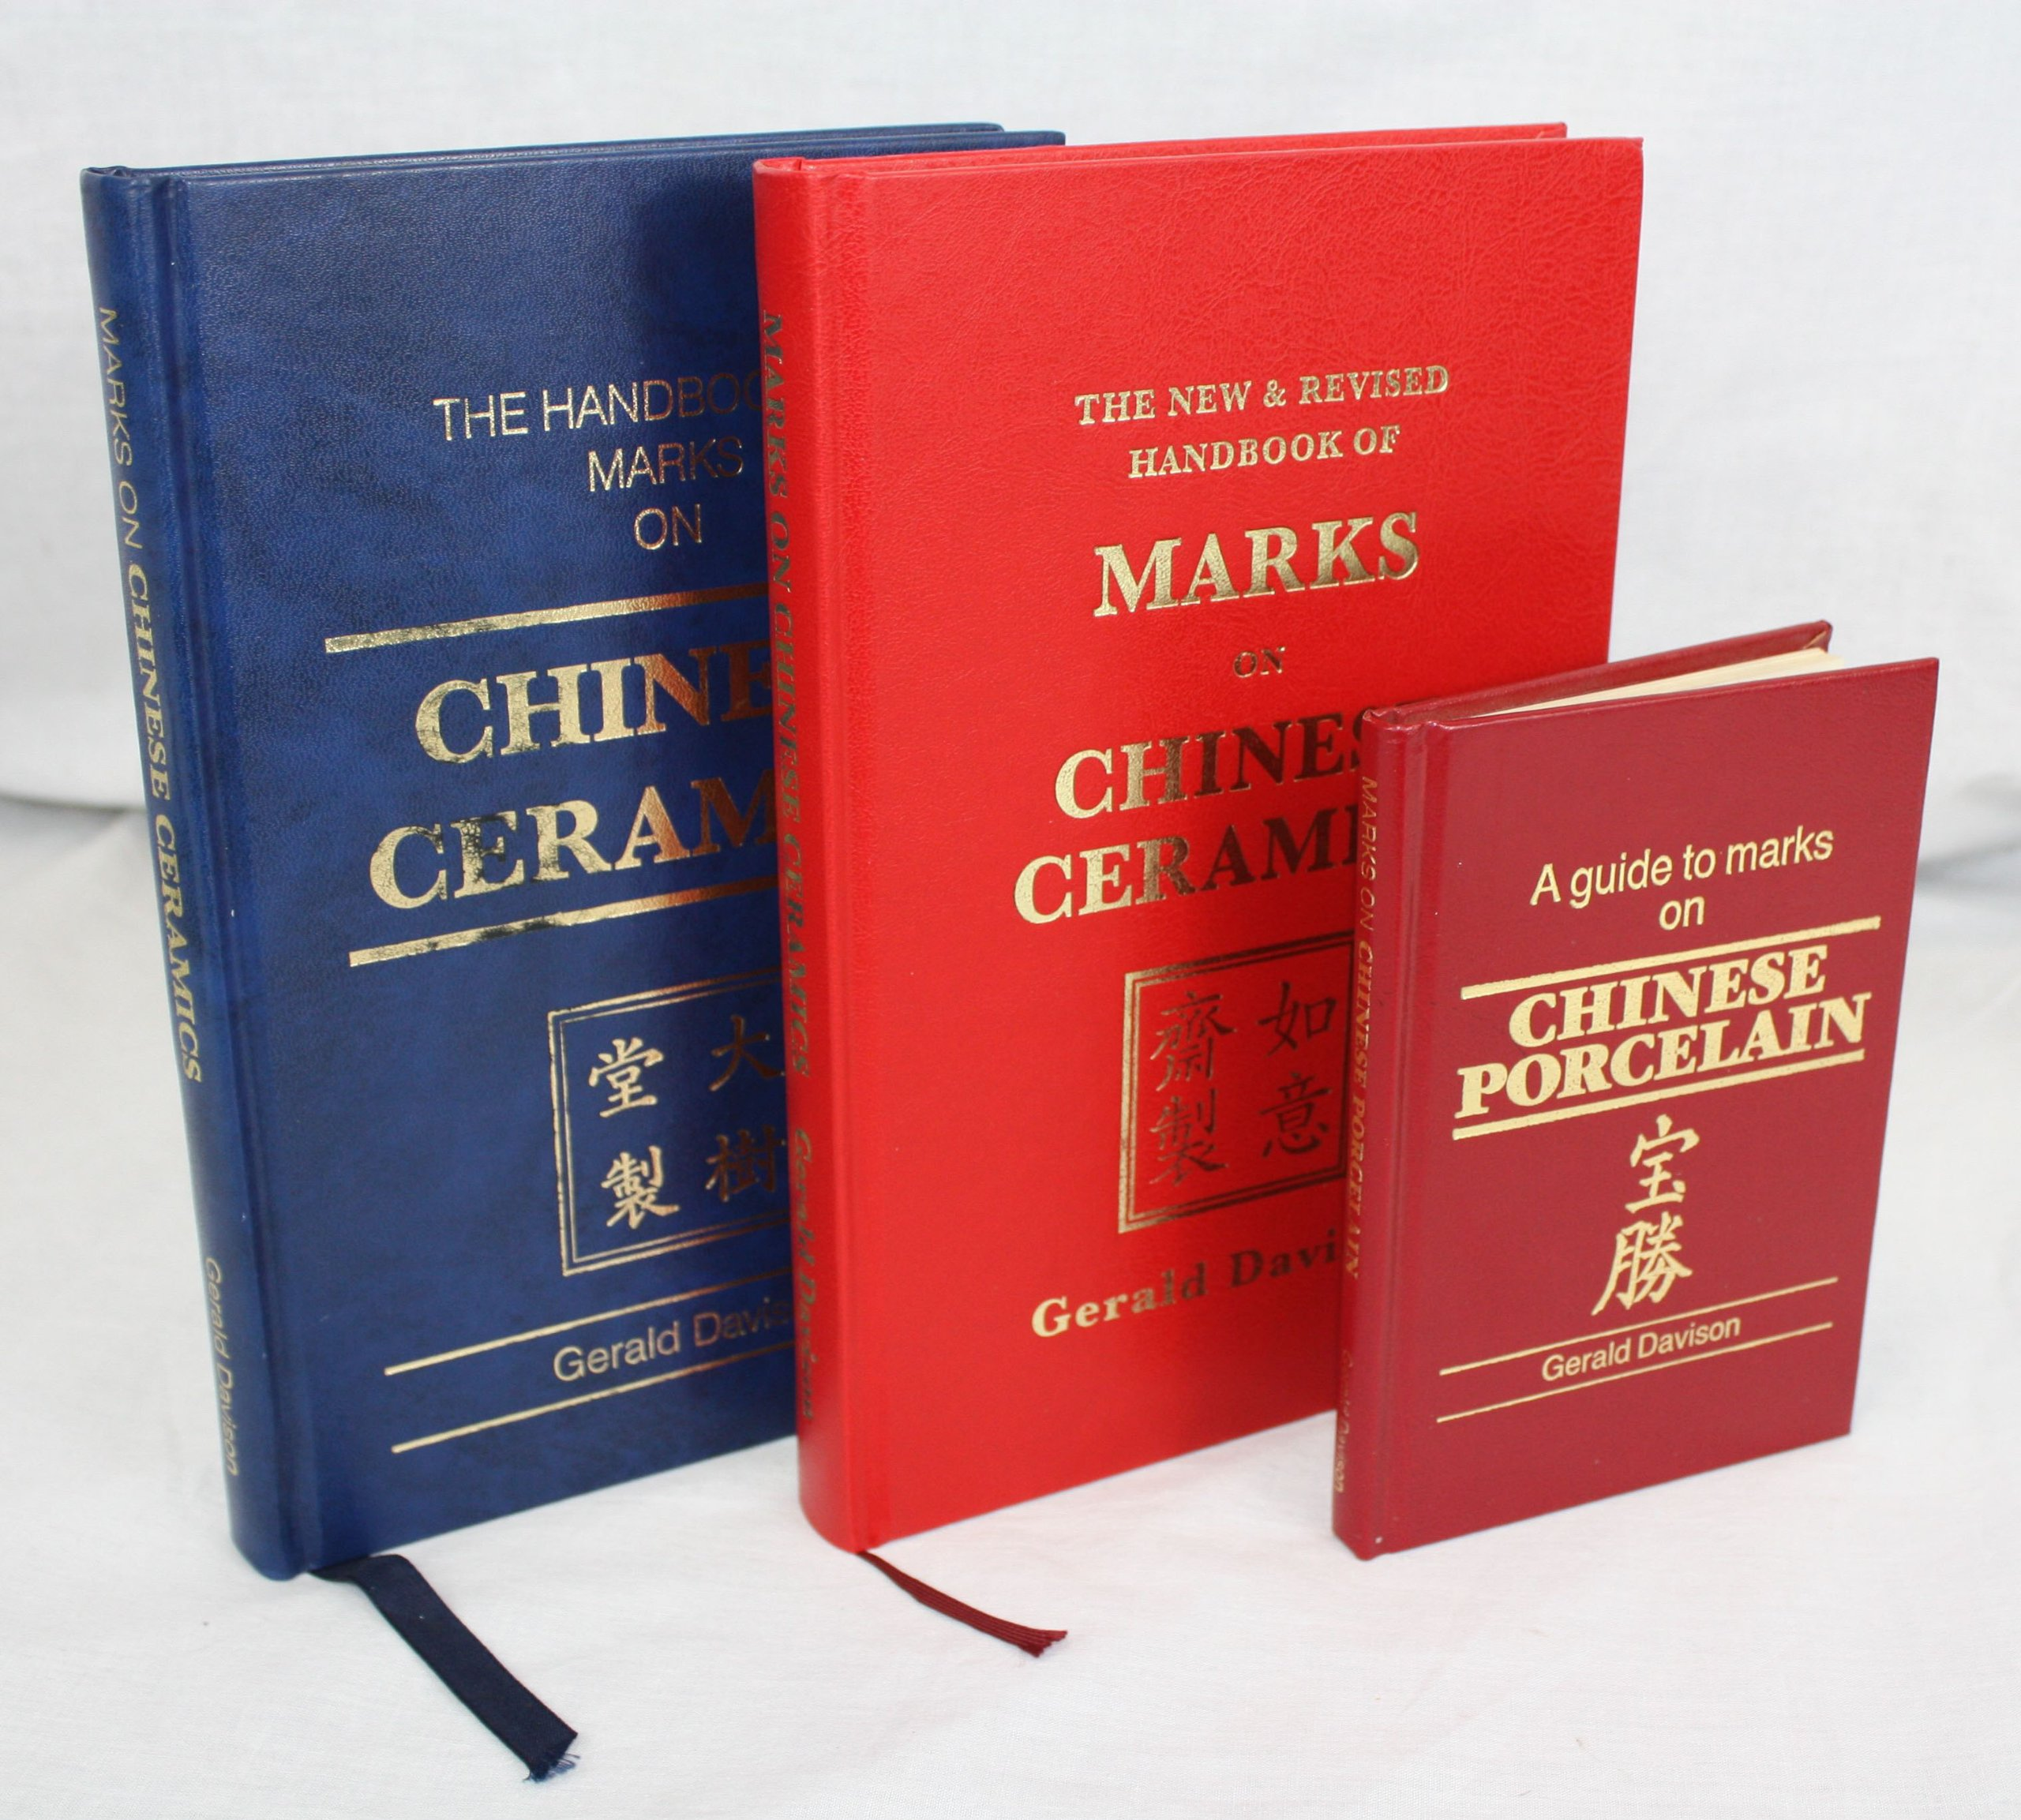 Chinese of ceramics handbook marks on the Gerald Davison